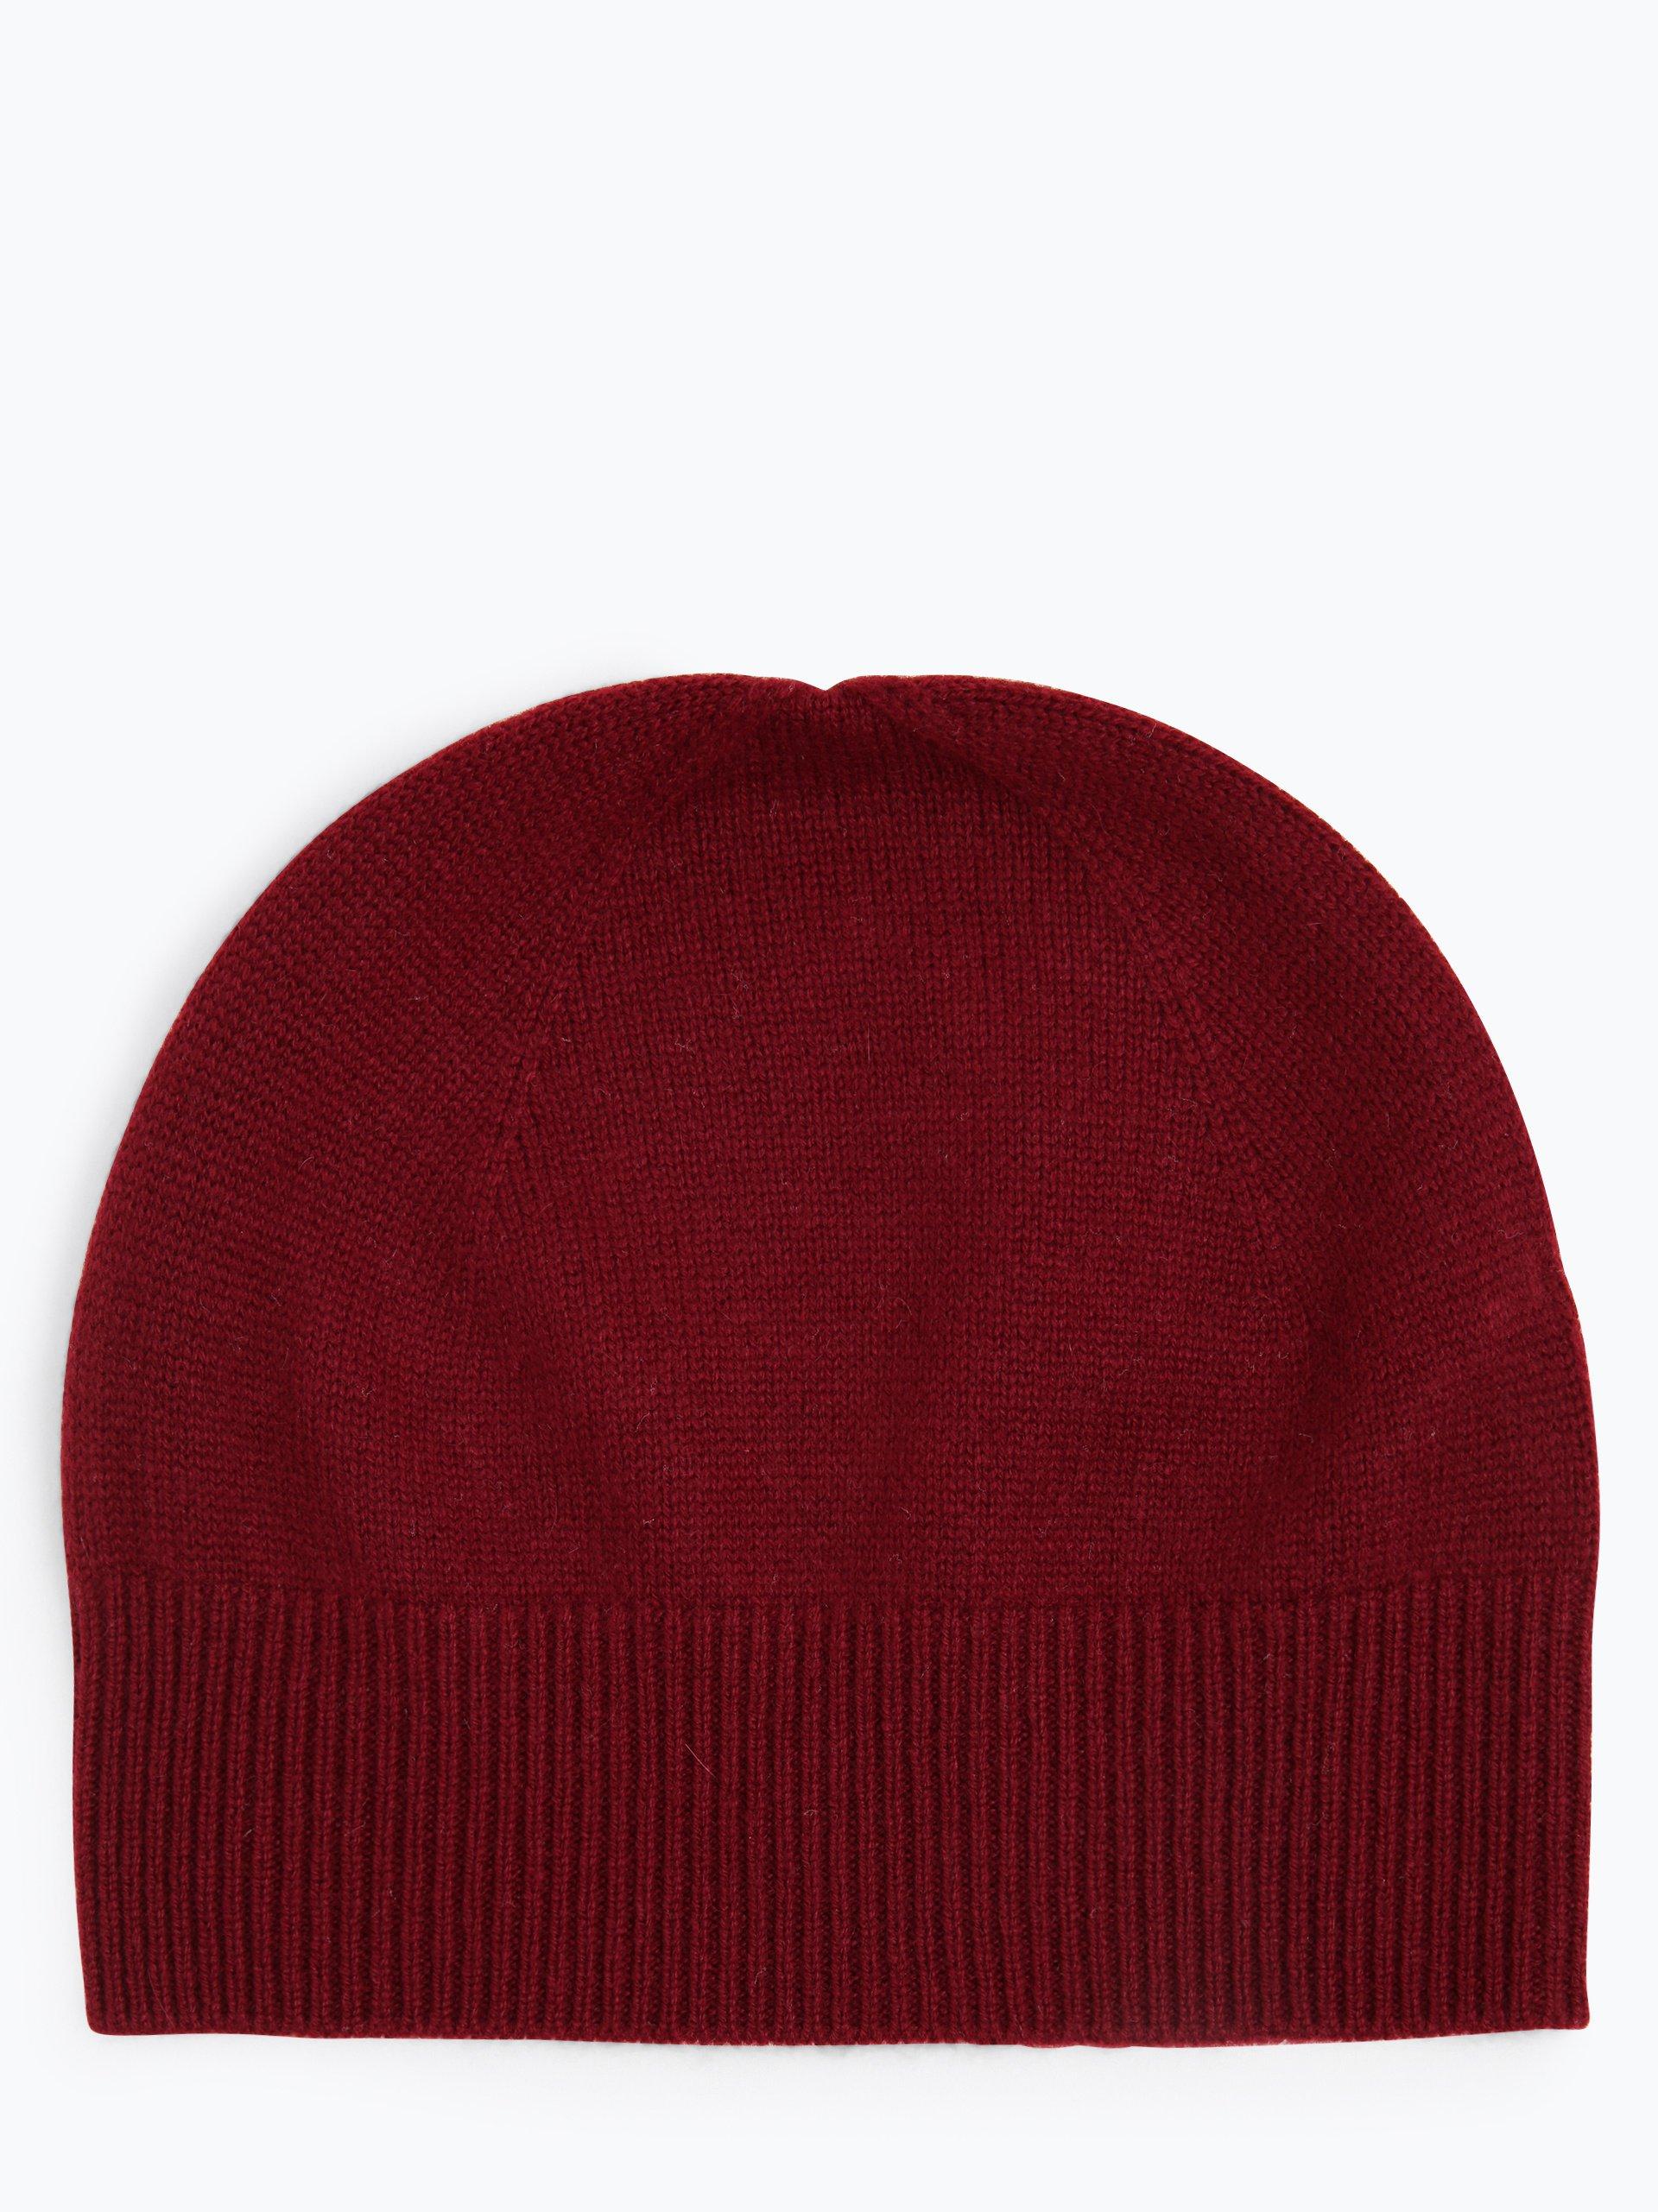 Apriori Damen Pure Cashmere Mütze